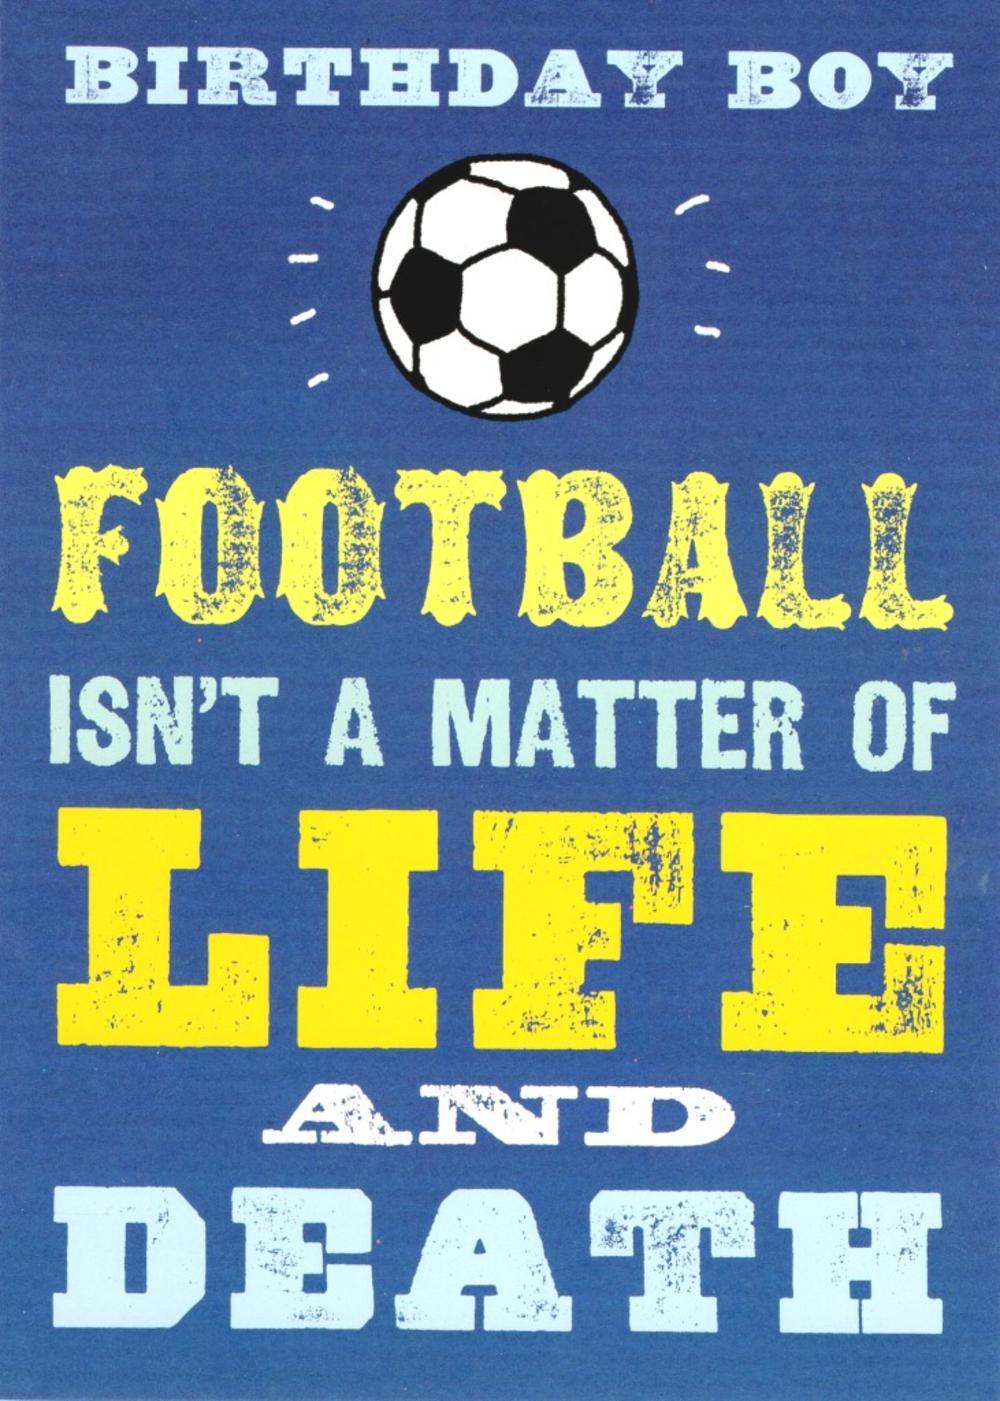 Football Isn't Life & Death Funny Birthday Card